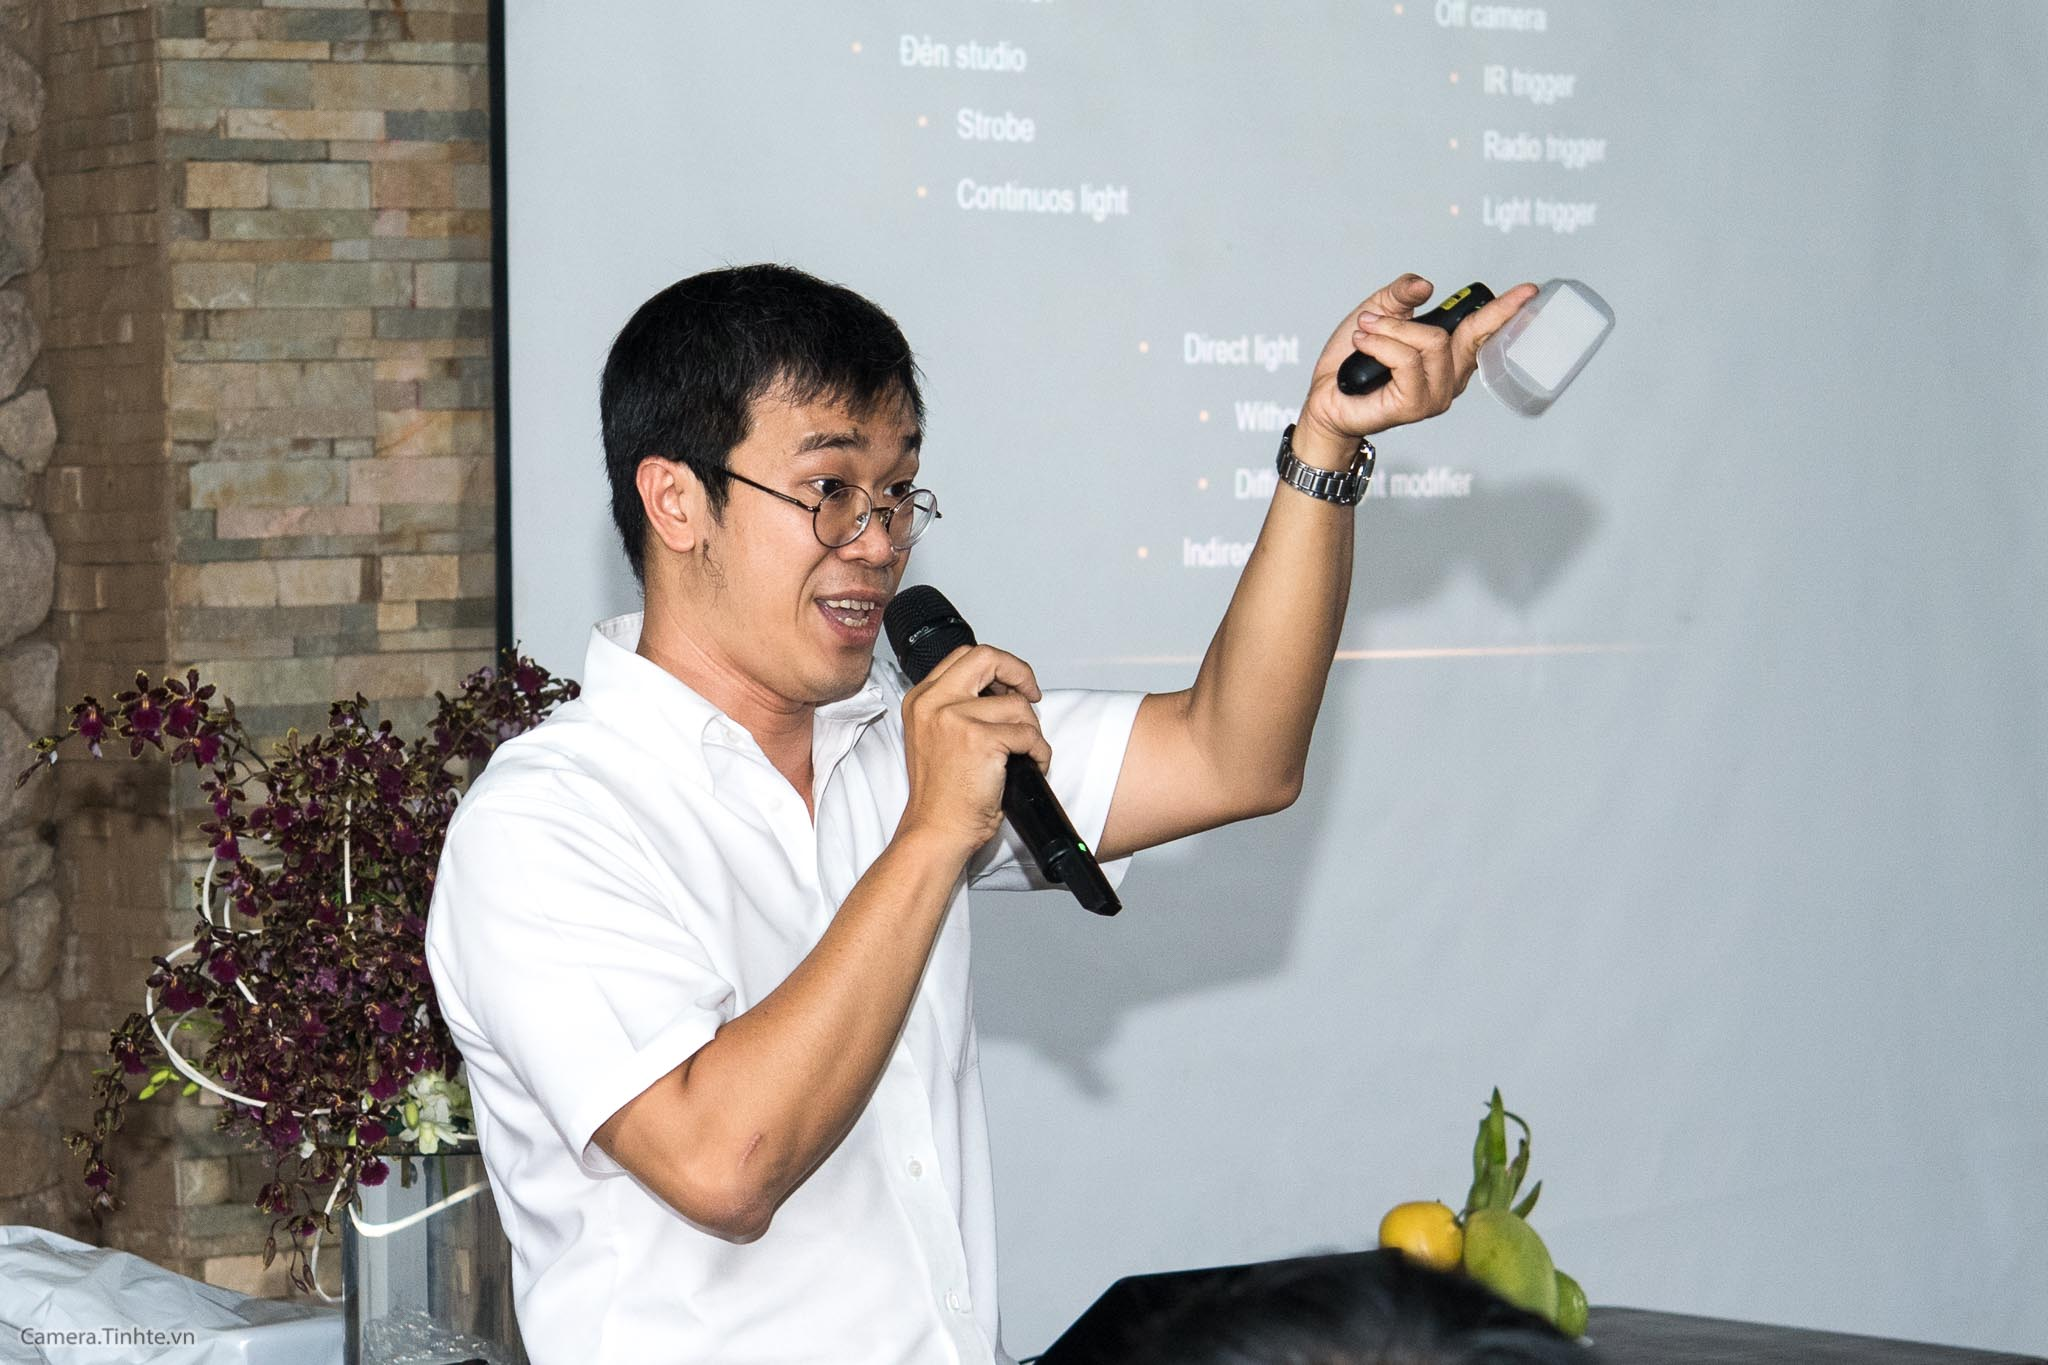 NACB 3 - Flash 2 - Camera.tinhte.vn-8.jpg